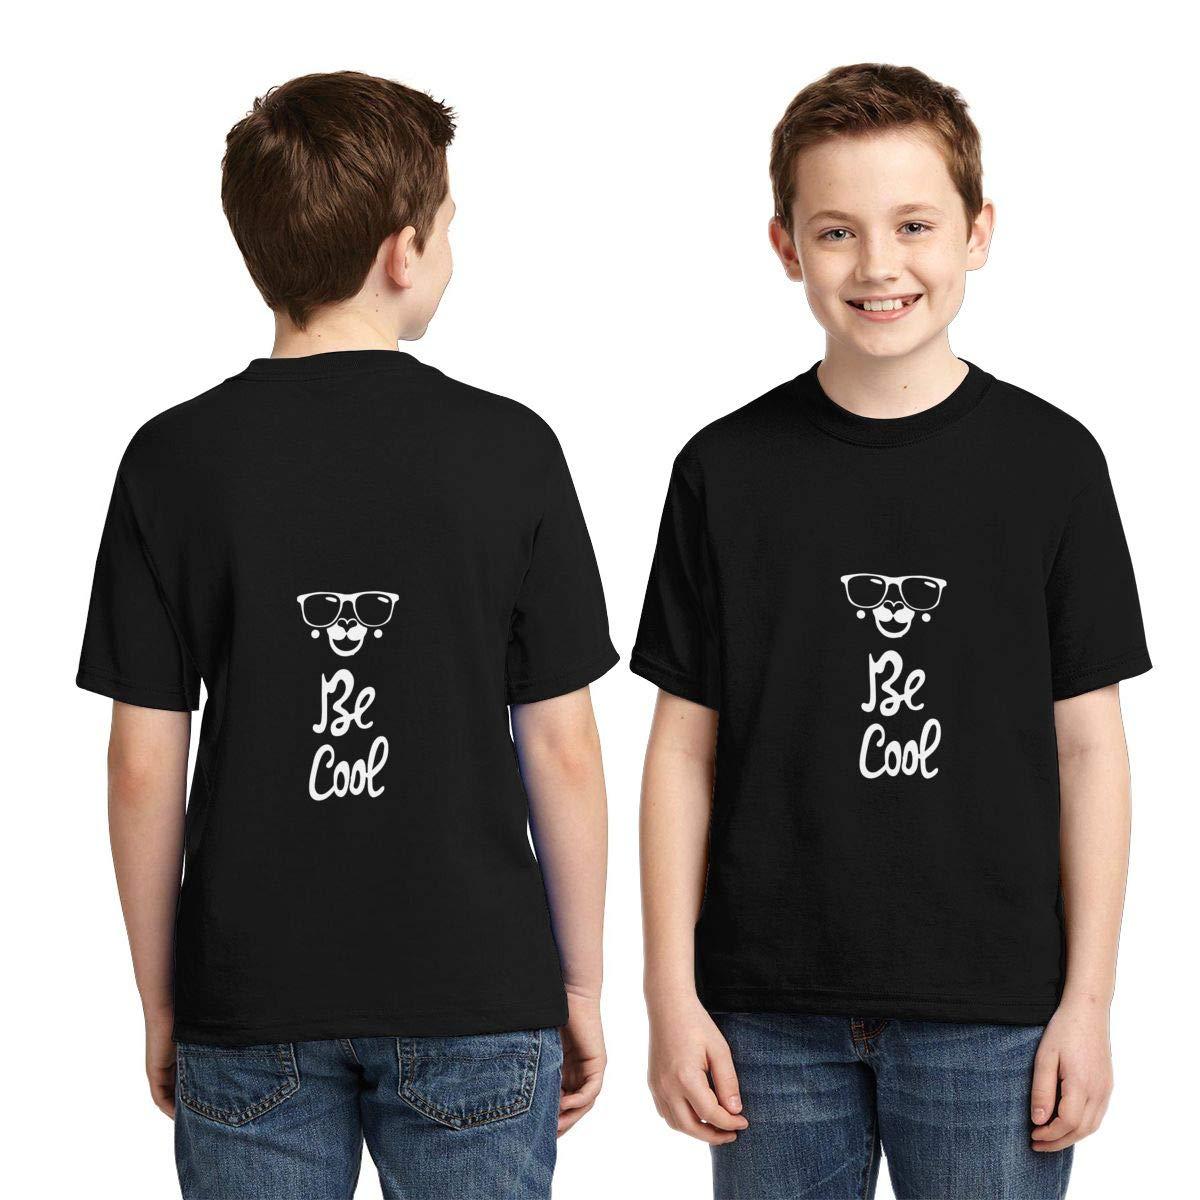 Vy32jg-2 Short Sleeve Llama Cool Shirts for Boys Kawaii Tunic Tops XS-XL